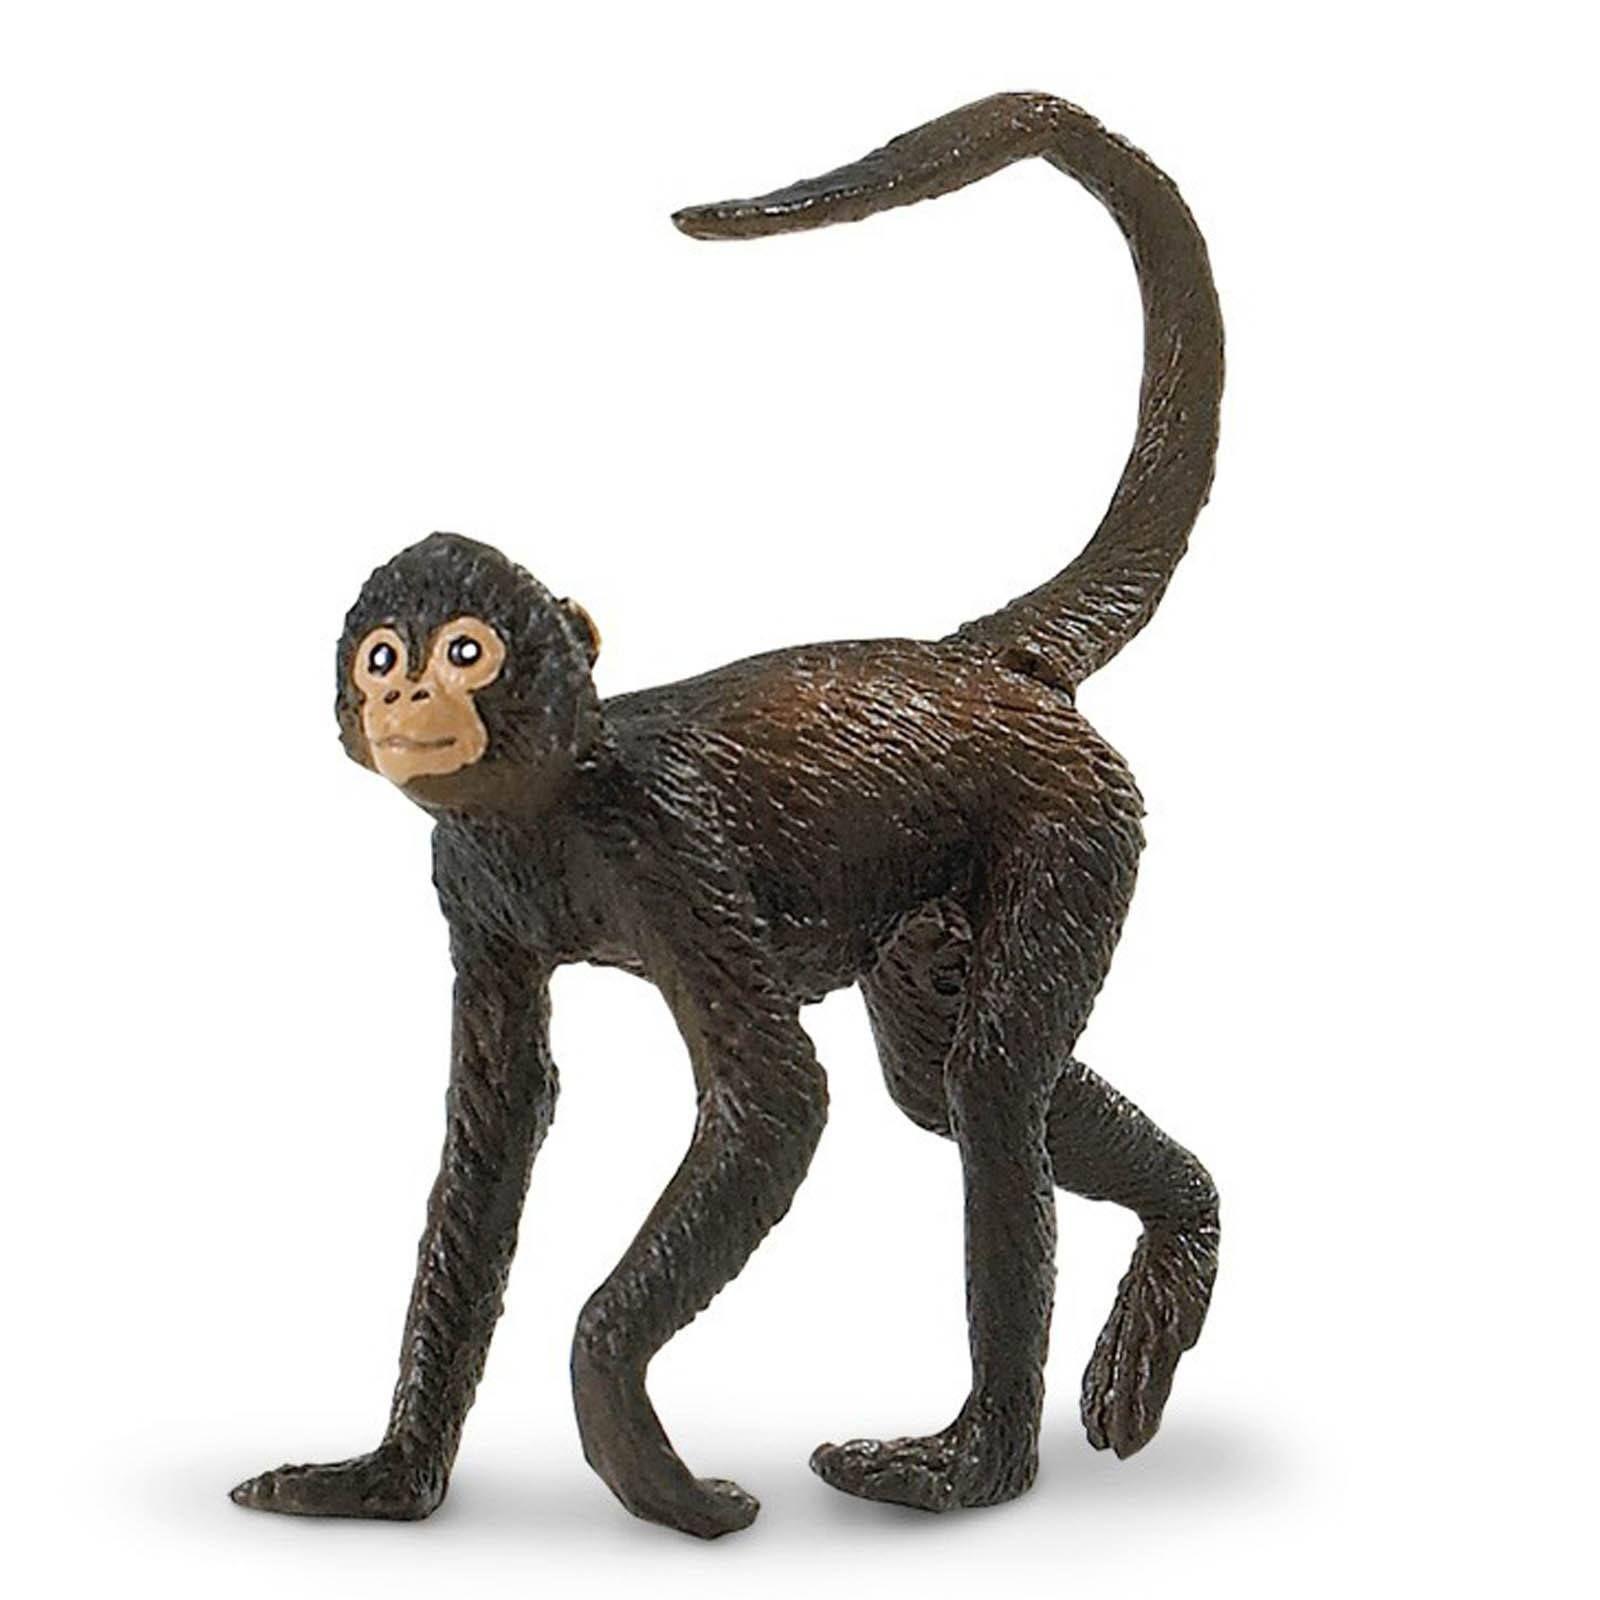 Spider Monkey Wildlife Figure Safari Ltd